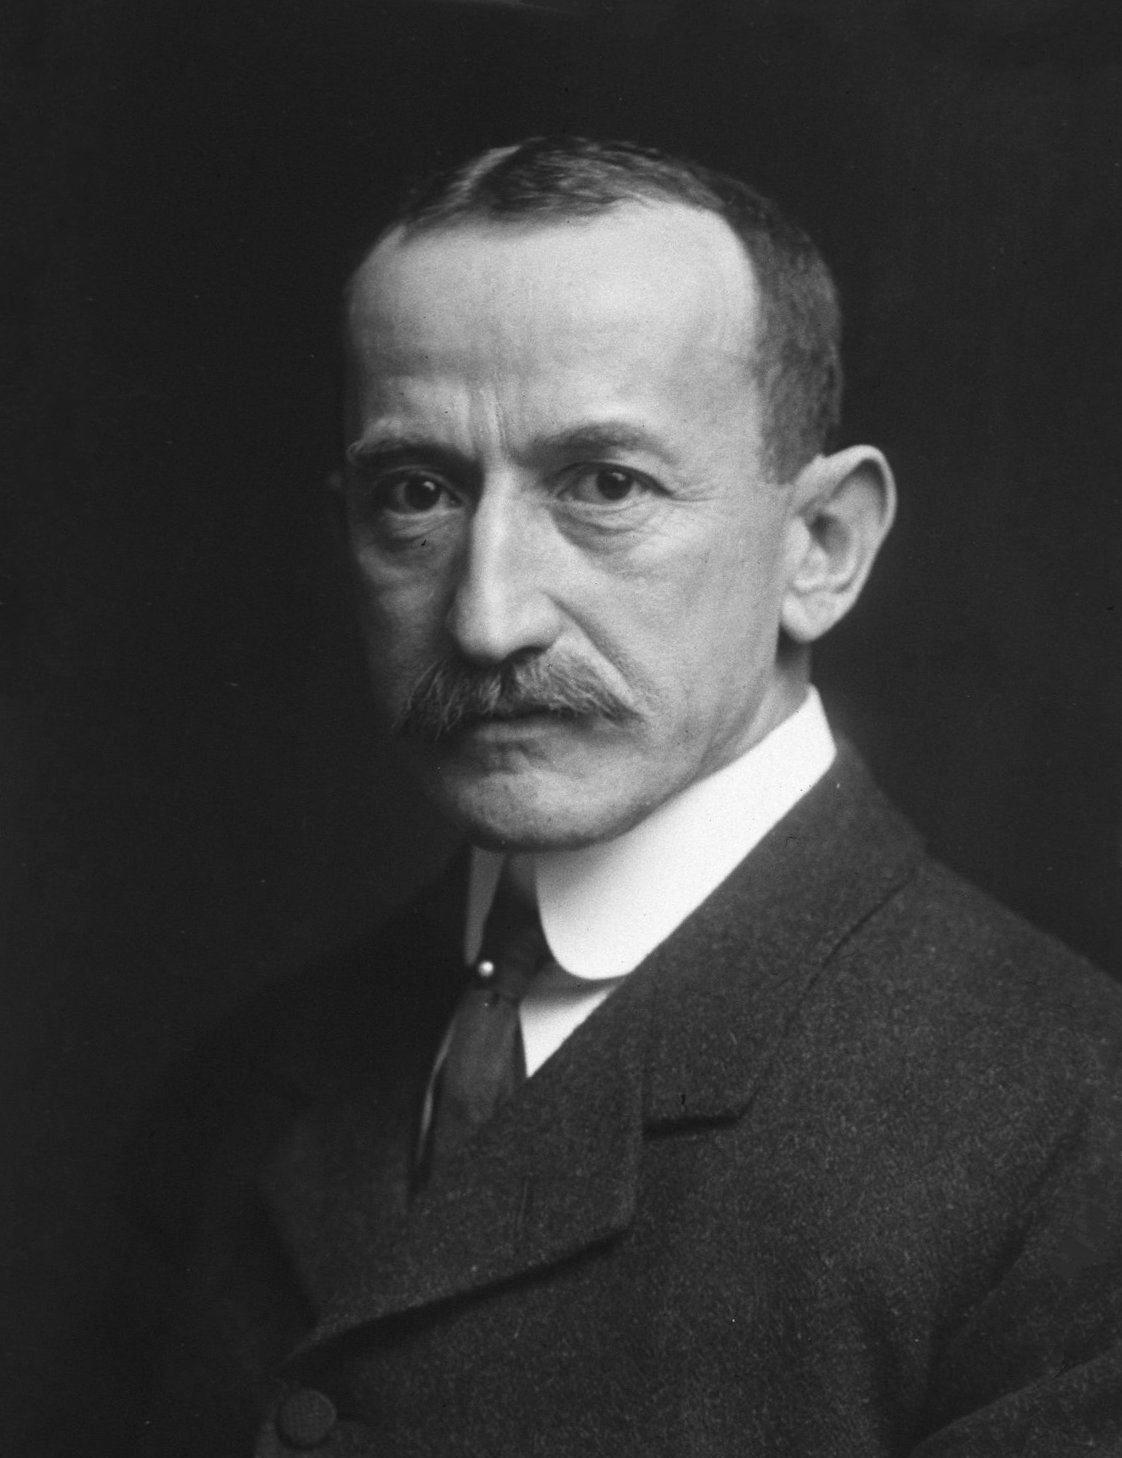 Karl Koller